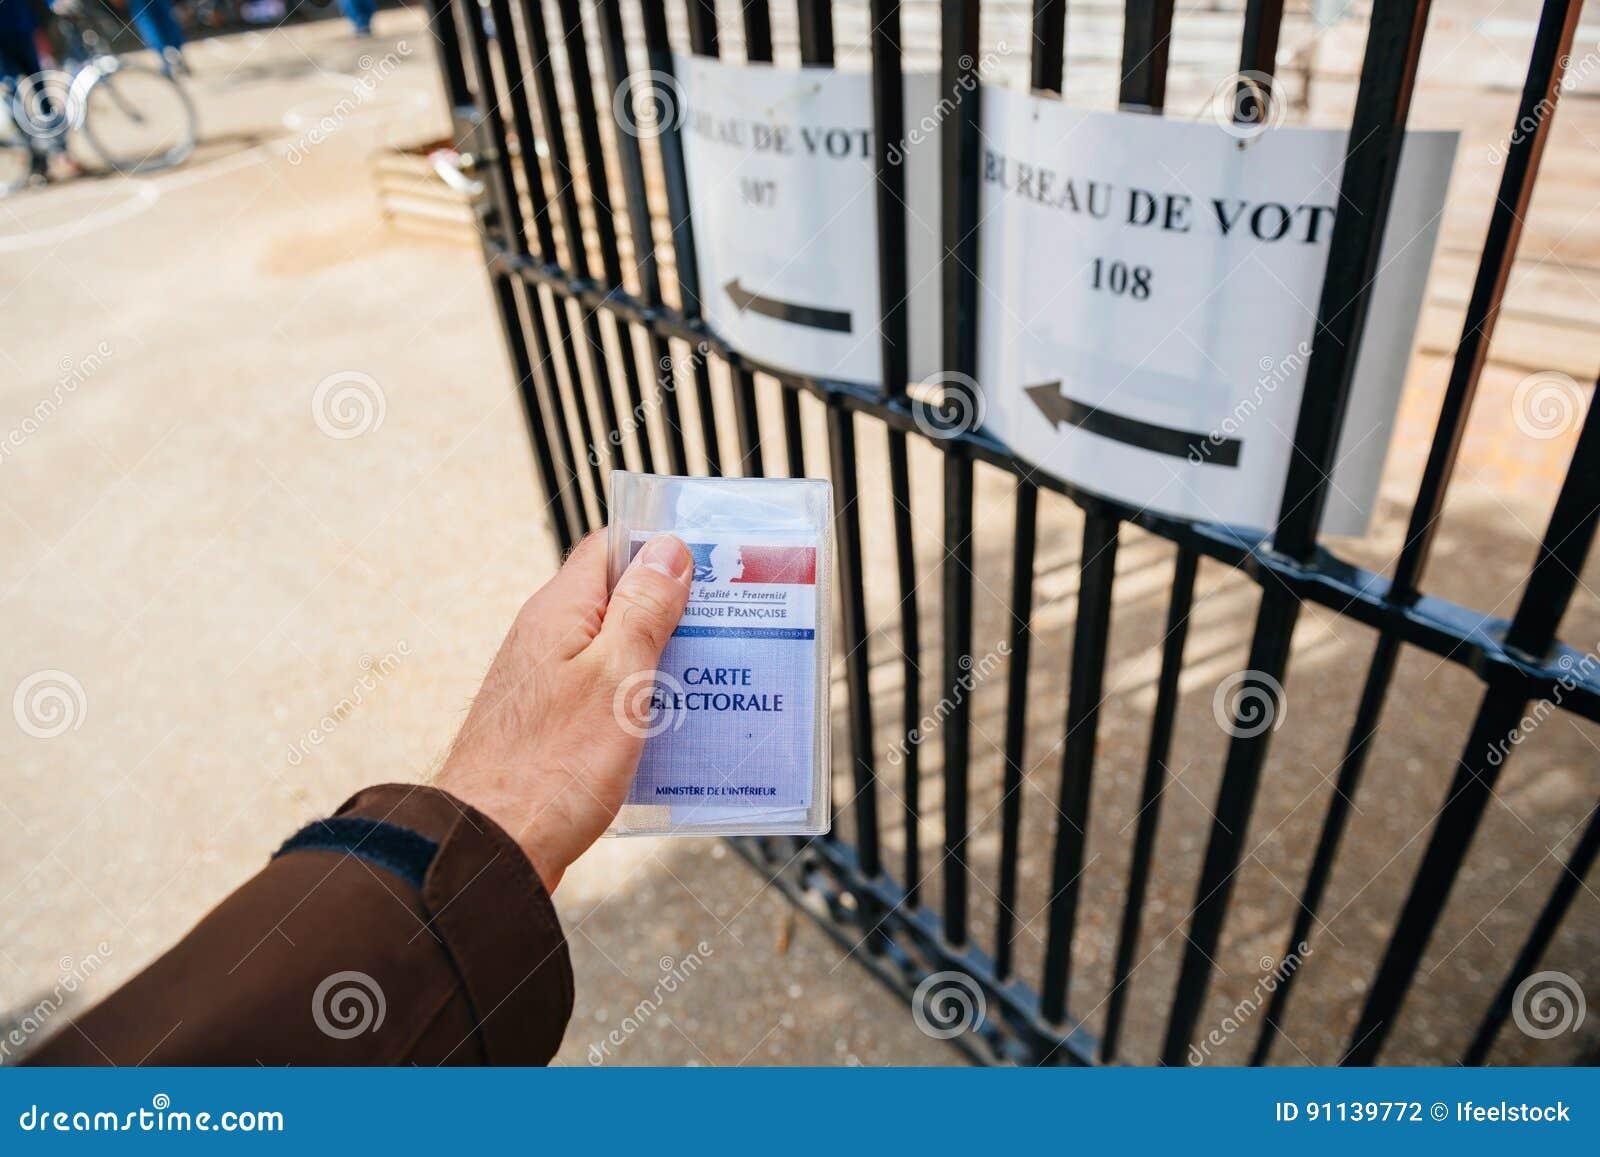 Bureau de vote personal perspective pov editorial photography